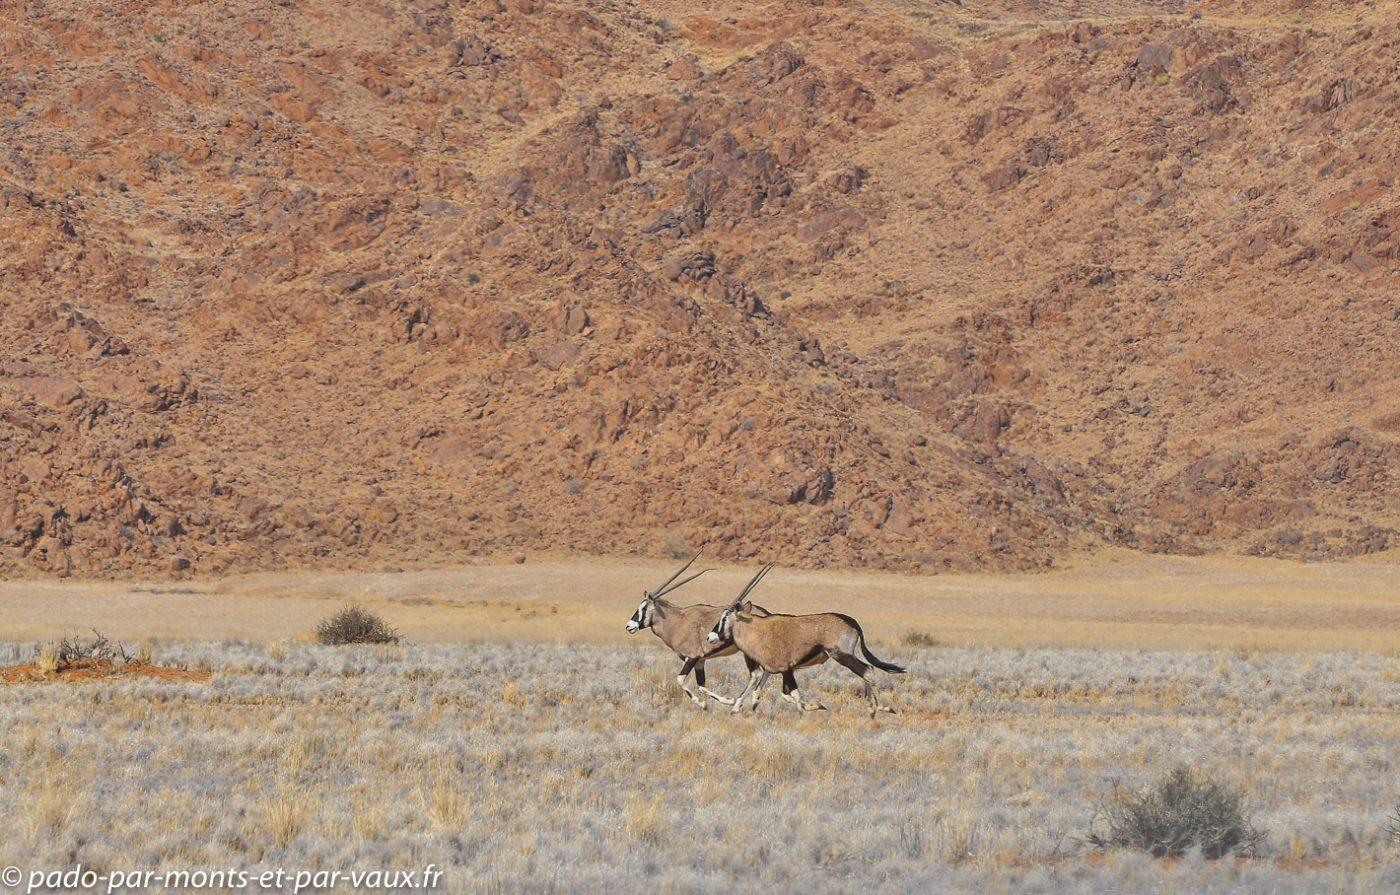 Namibie 2013 - D707 vers la Namib Rand reserve - Oryx